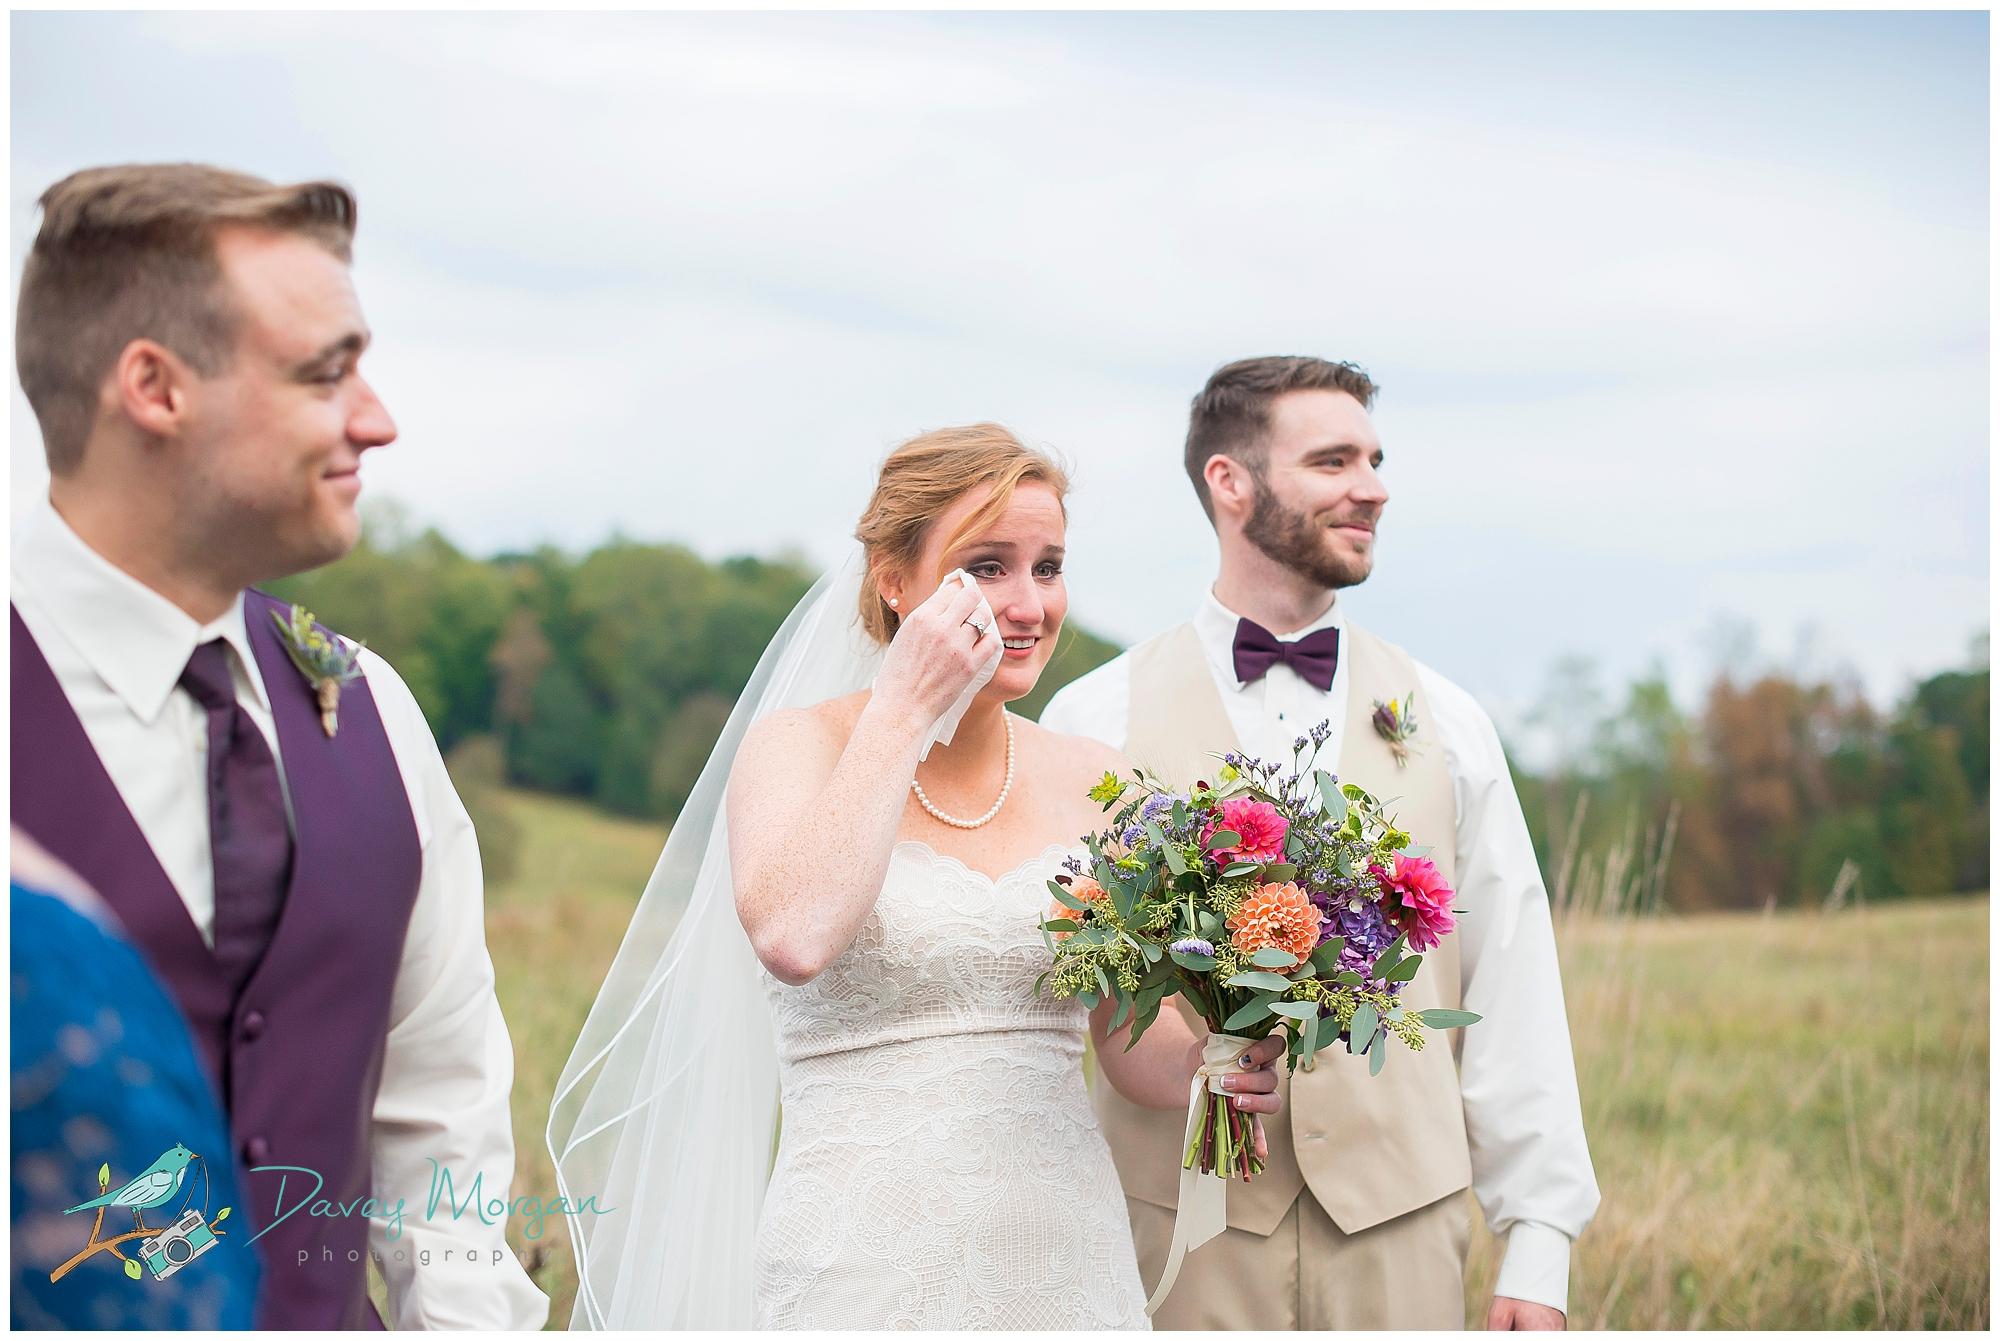 Greenville Sc Portrait And Wedding Photographer Davey